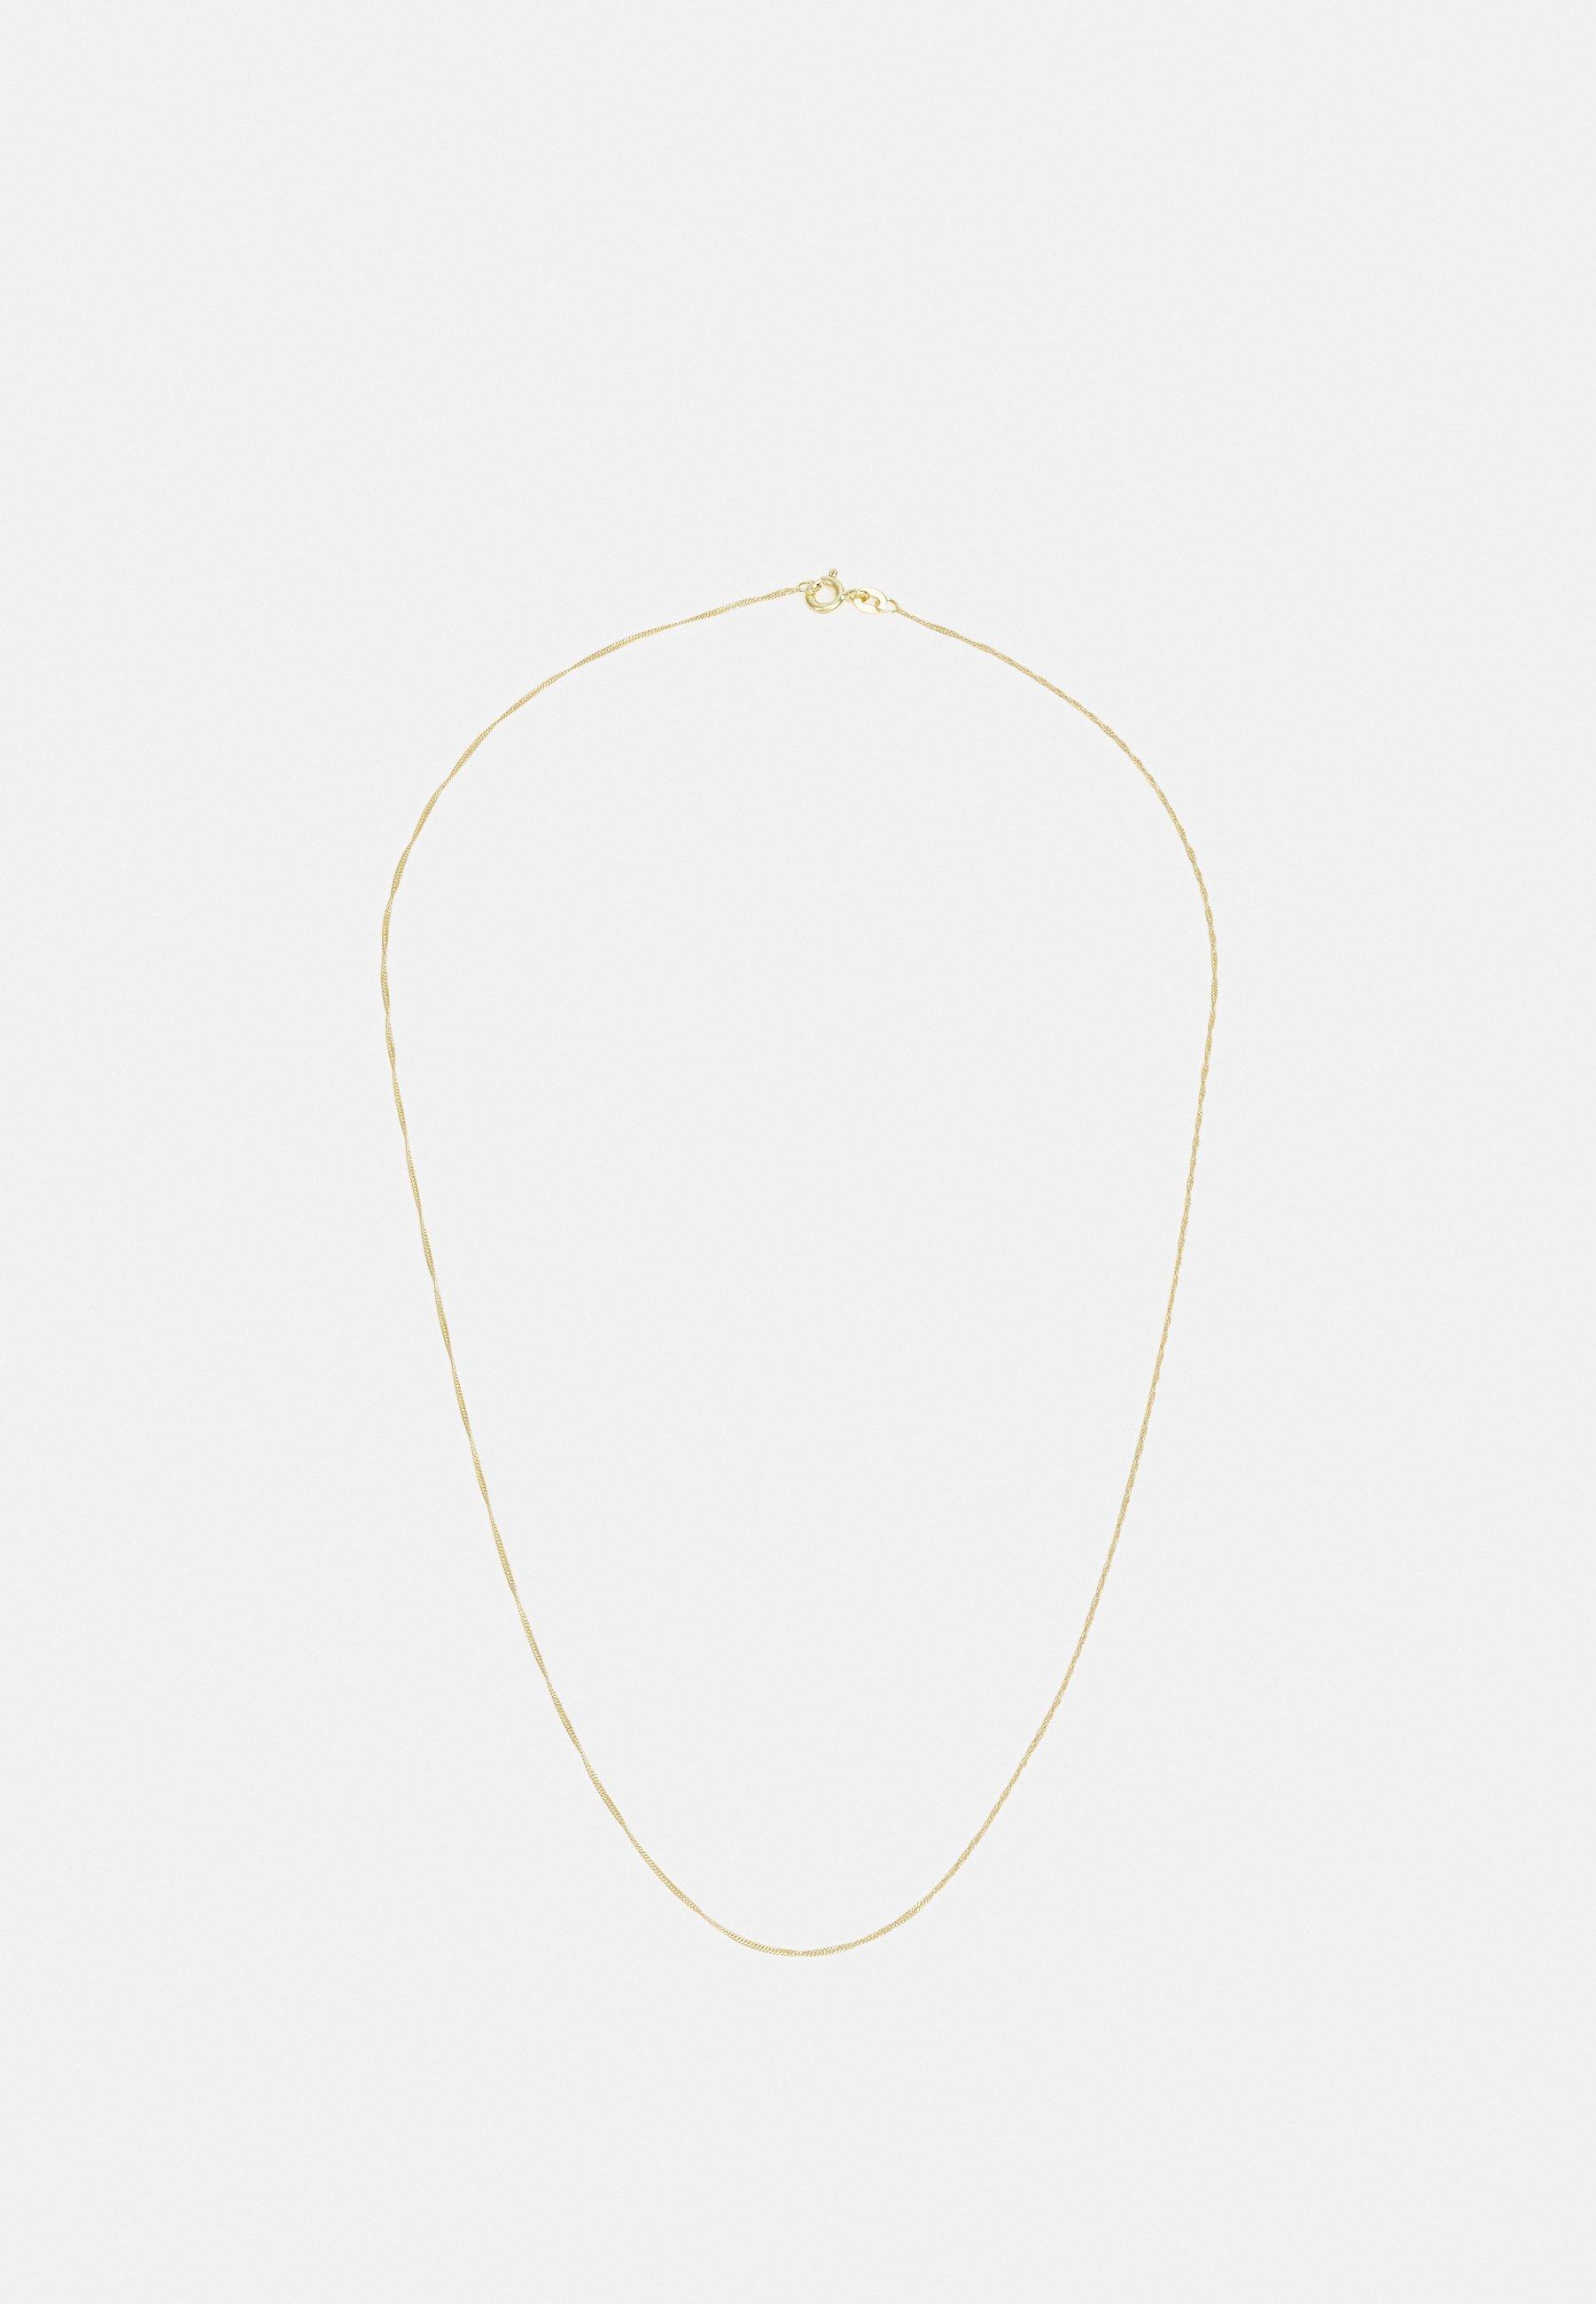 Donna 14KT (585) YELLOW GOLD SINGAPUR CHAIN - Collana